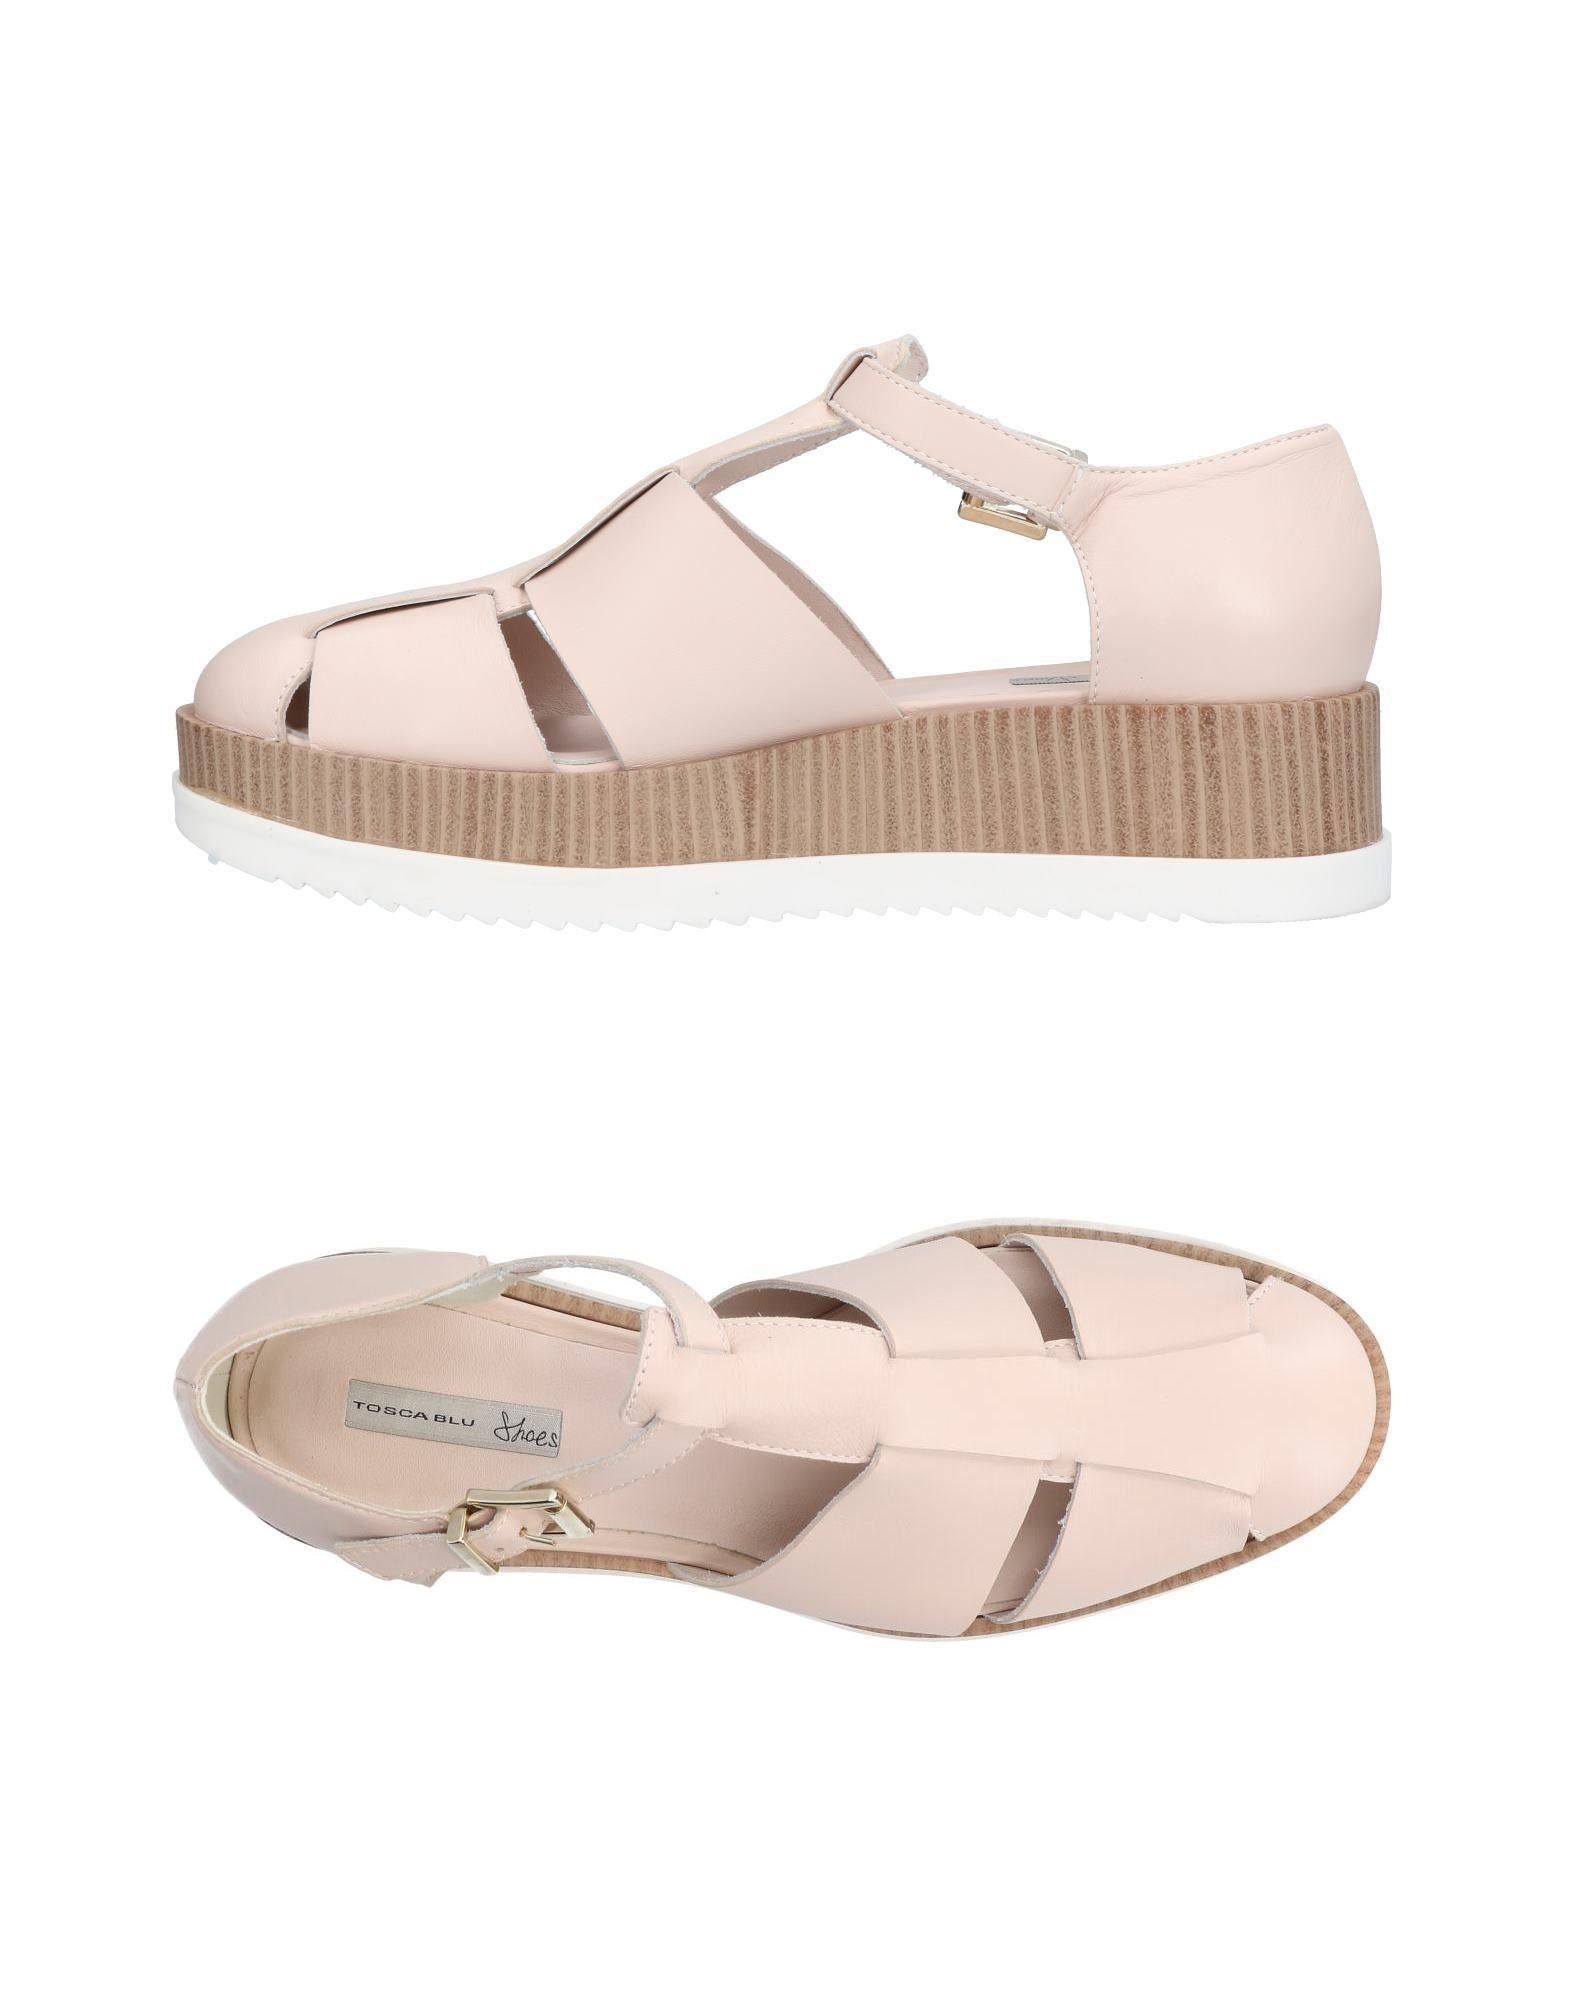 Tosca Blu Shoes Sandalen Damen  11432577HR Gute Qualität beliebte Schuhe